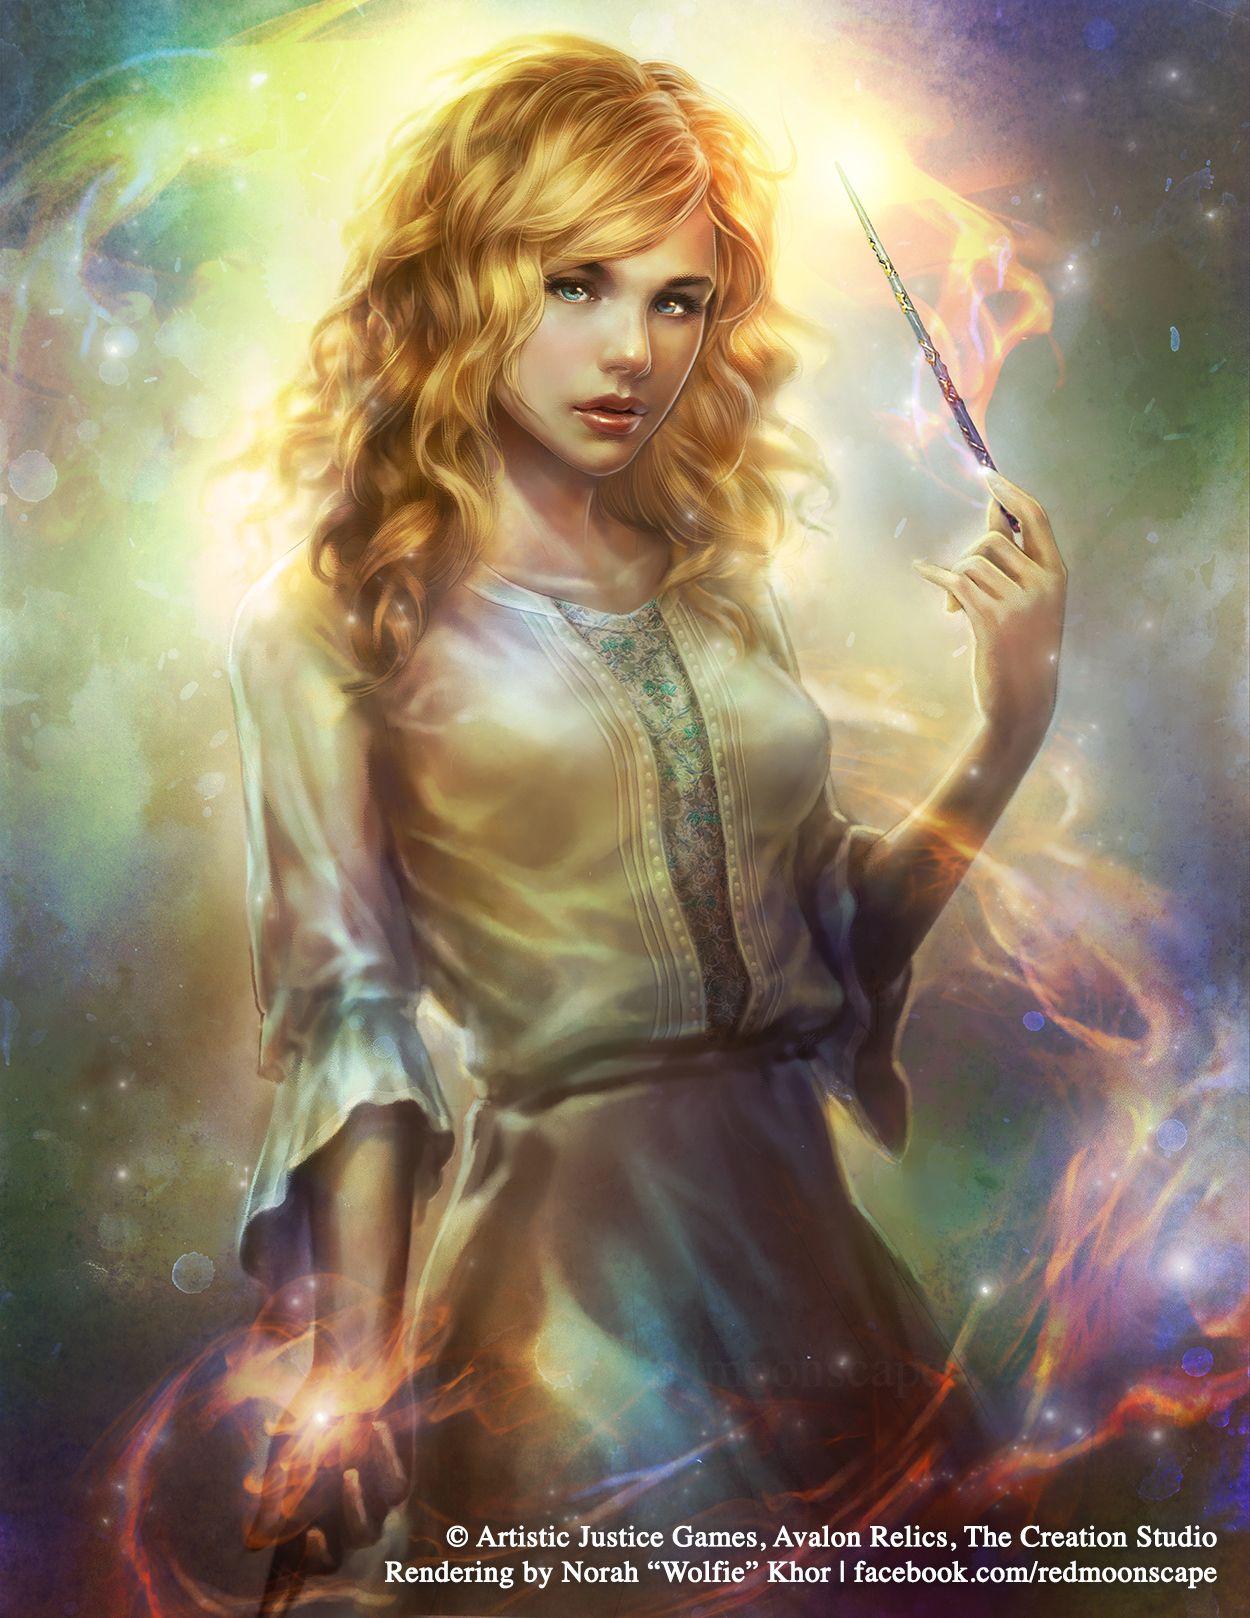 avalon relics: angiewolfie-chama on deviantart | fantasy art